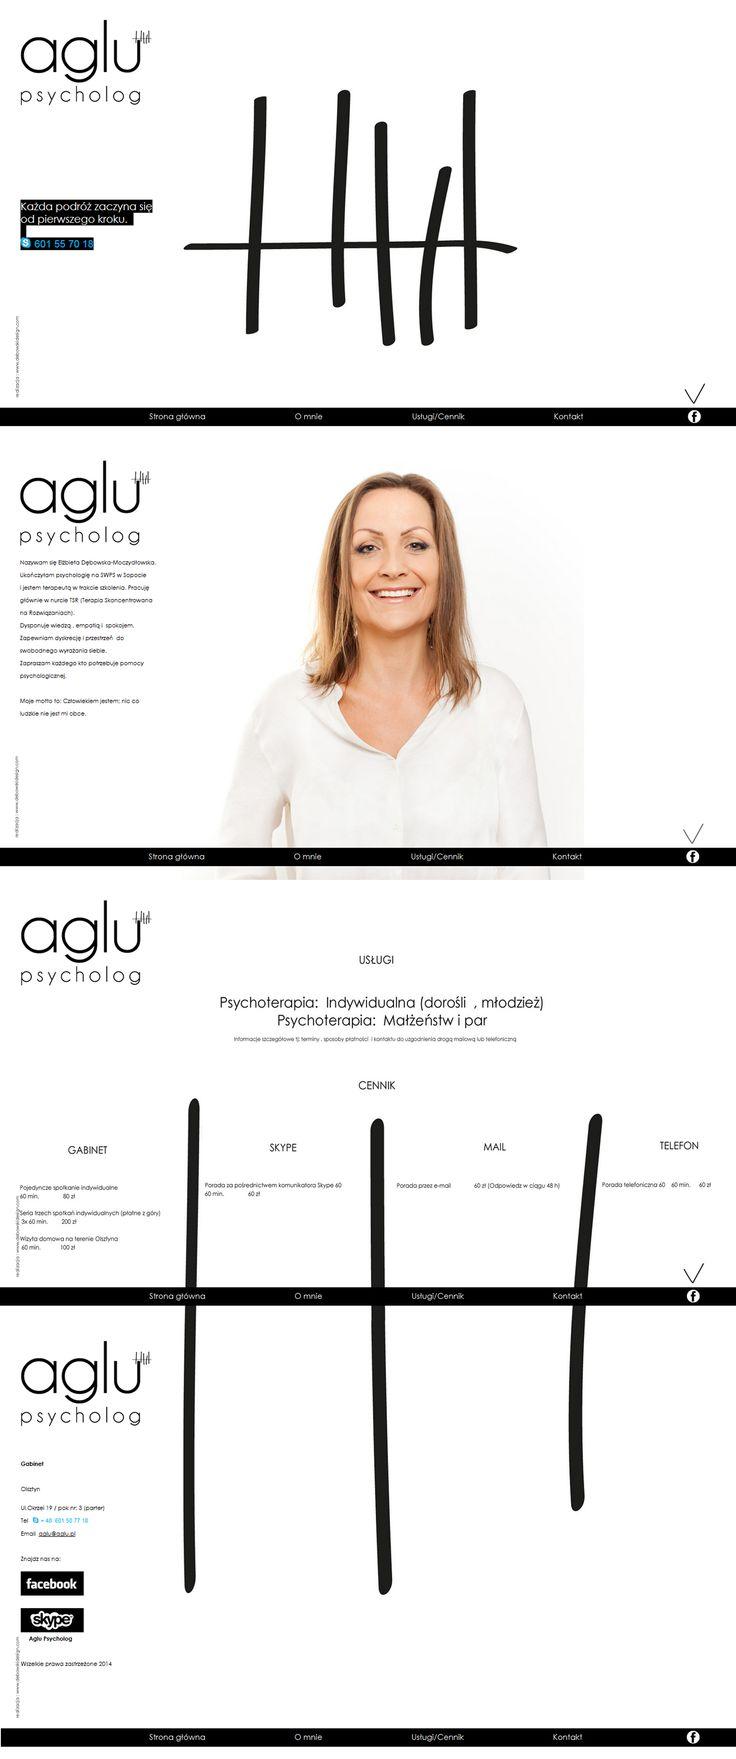 Web design I AGLU Psychologist I  Debowski Design www.debowskidesign.com